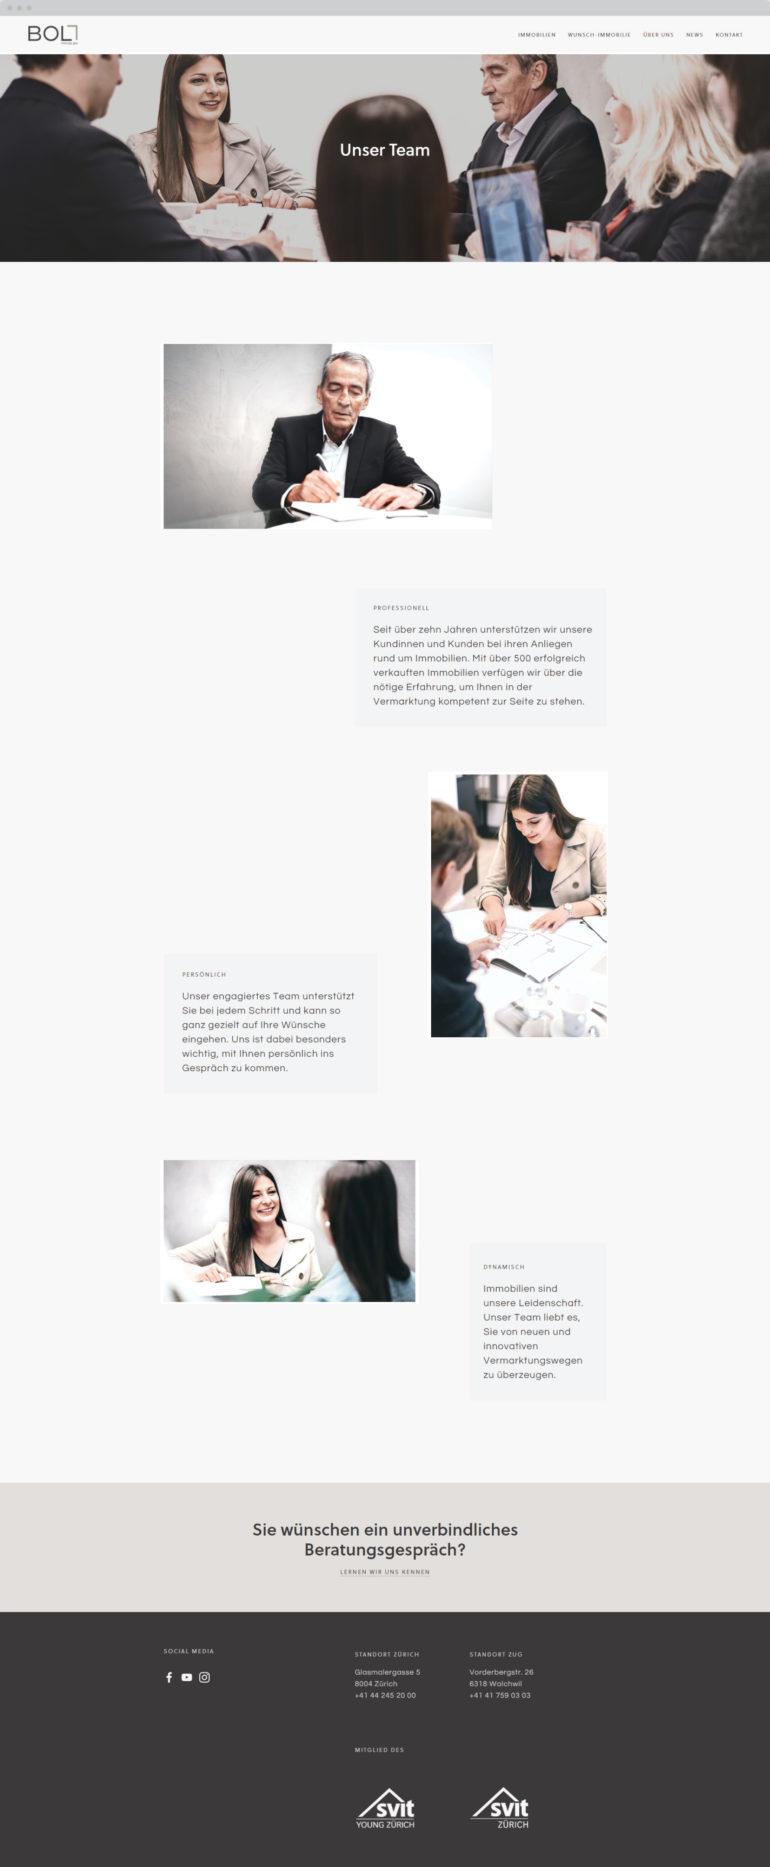 Mobile Digital Website Internet Homepage Redesign Design Struktur Content Online Auftrag Responsive Agentur Kommunikation Schweiz Werbung Social Media Facebook Instagram Snapchat Likes Follower